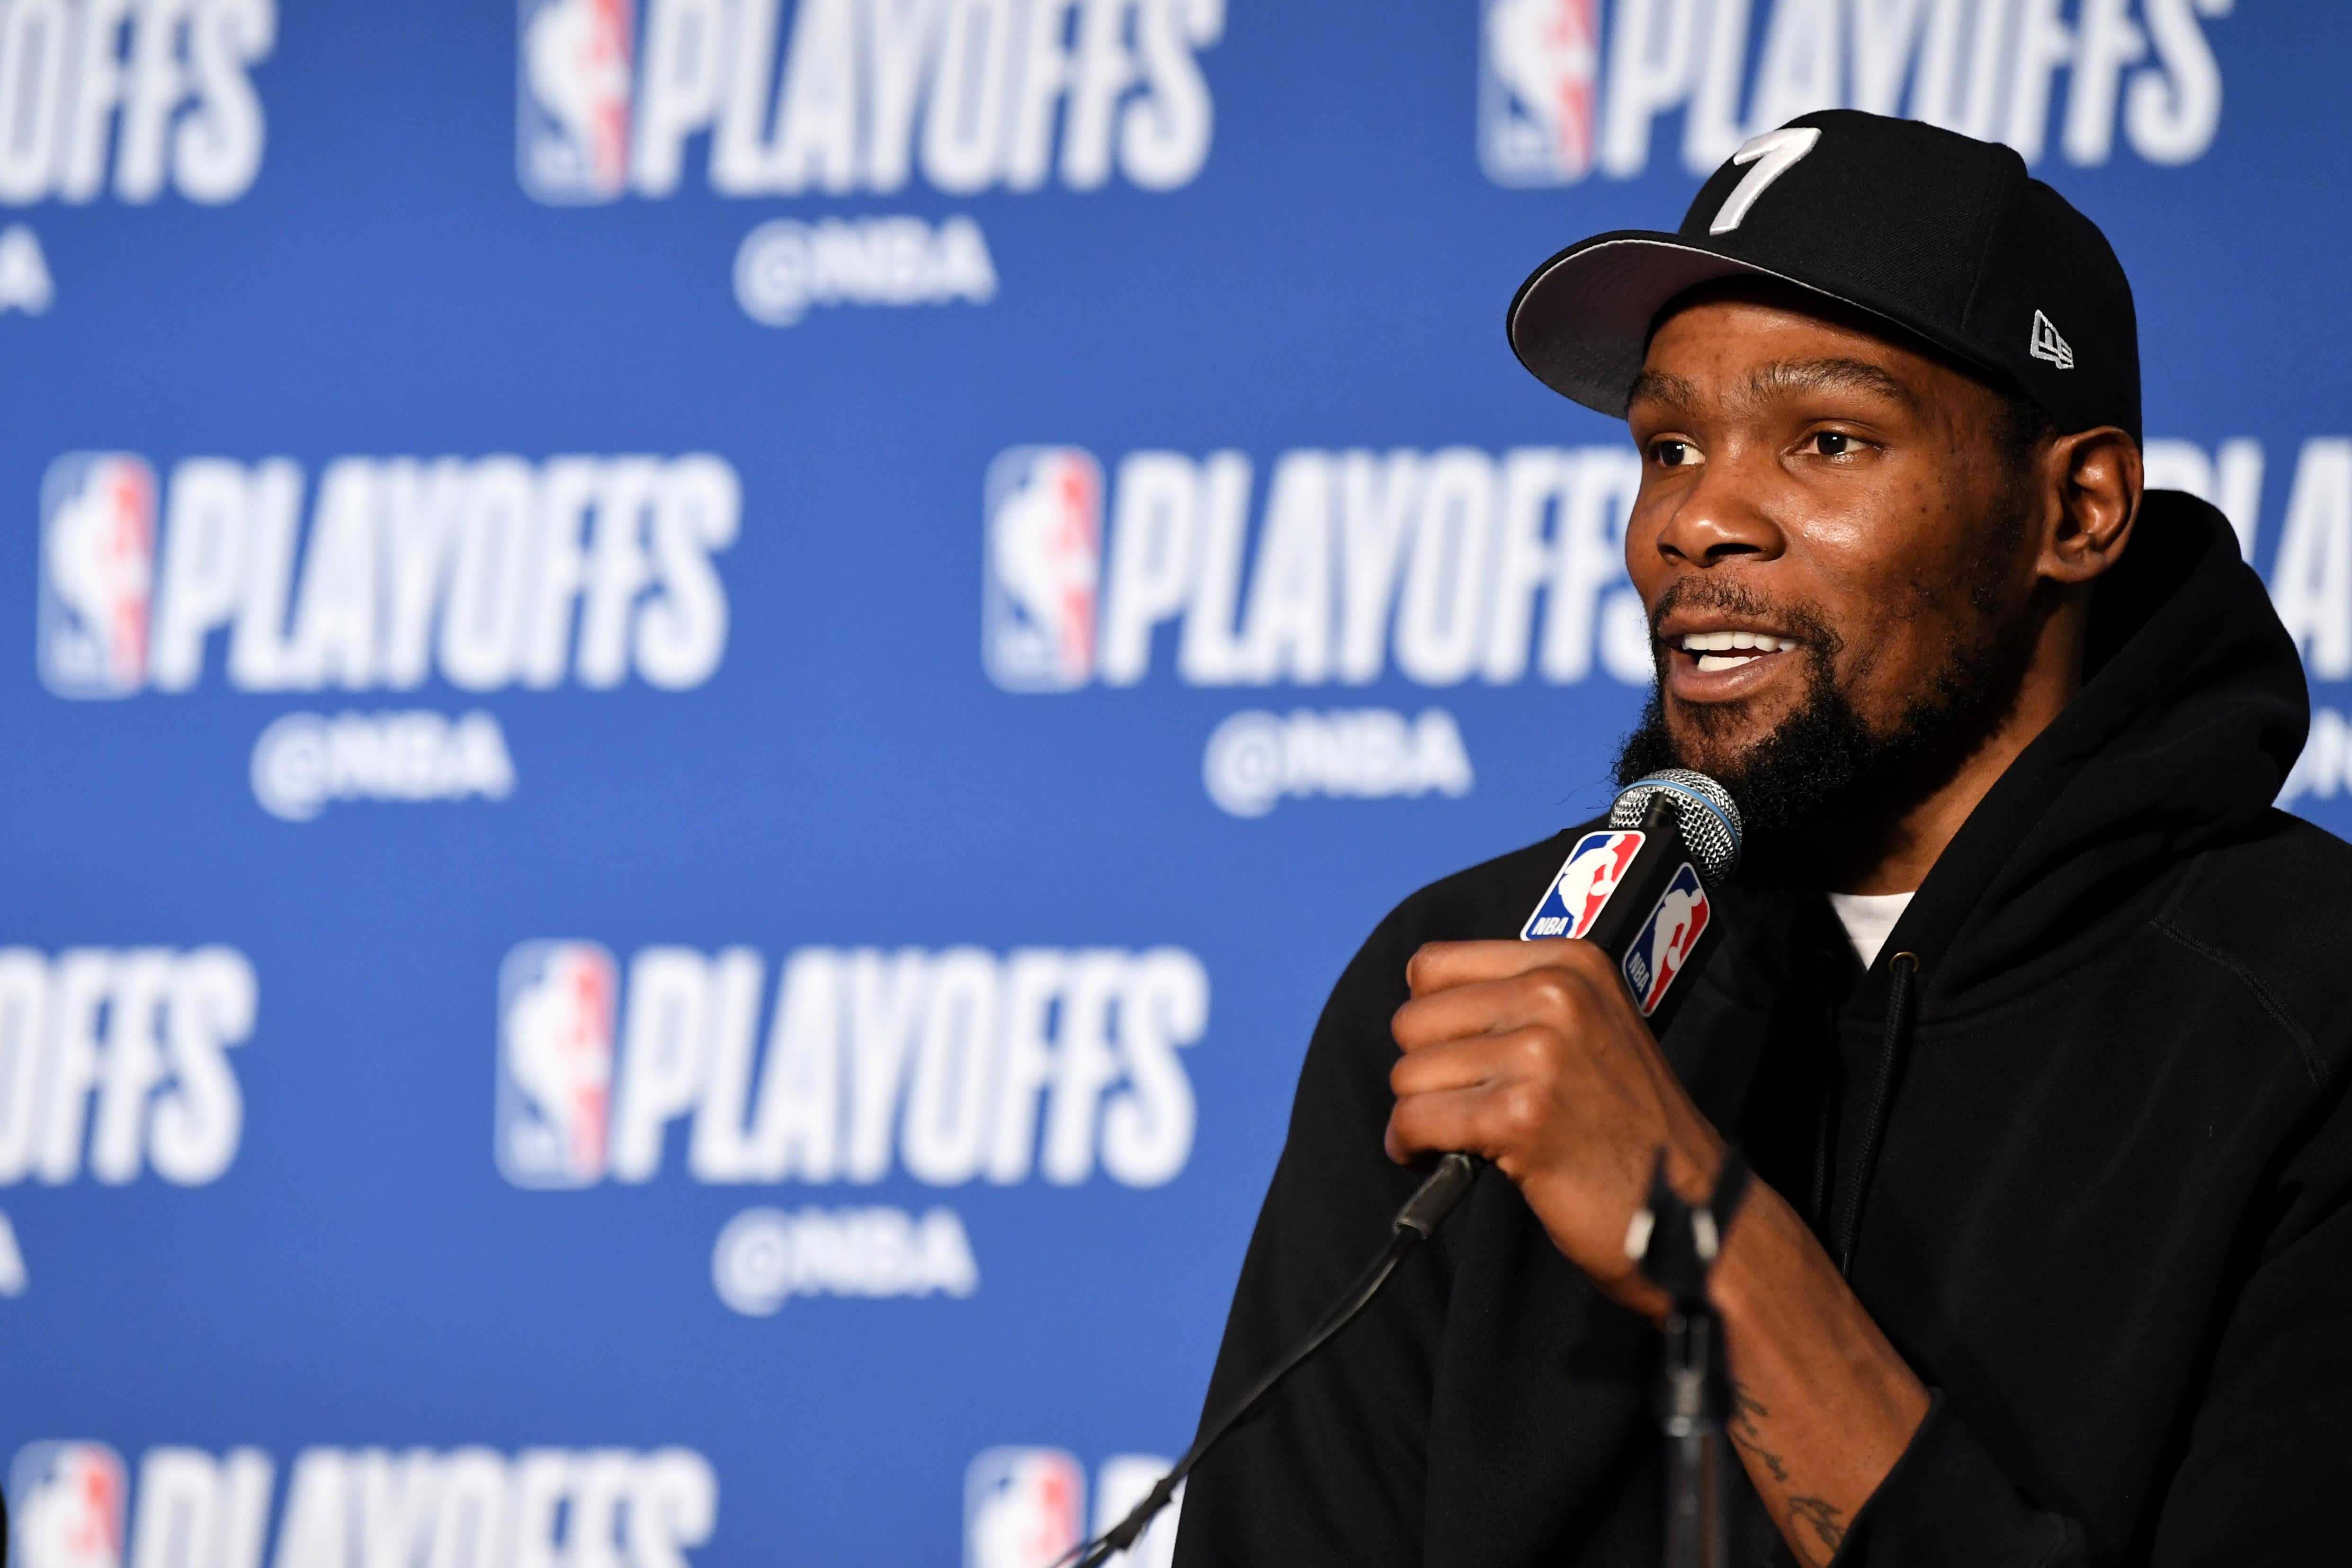 NBA star Kevin Durant takes 5% stake in Philadelphia Union soccer team